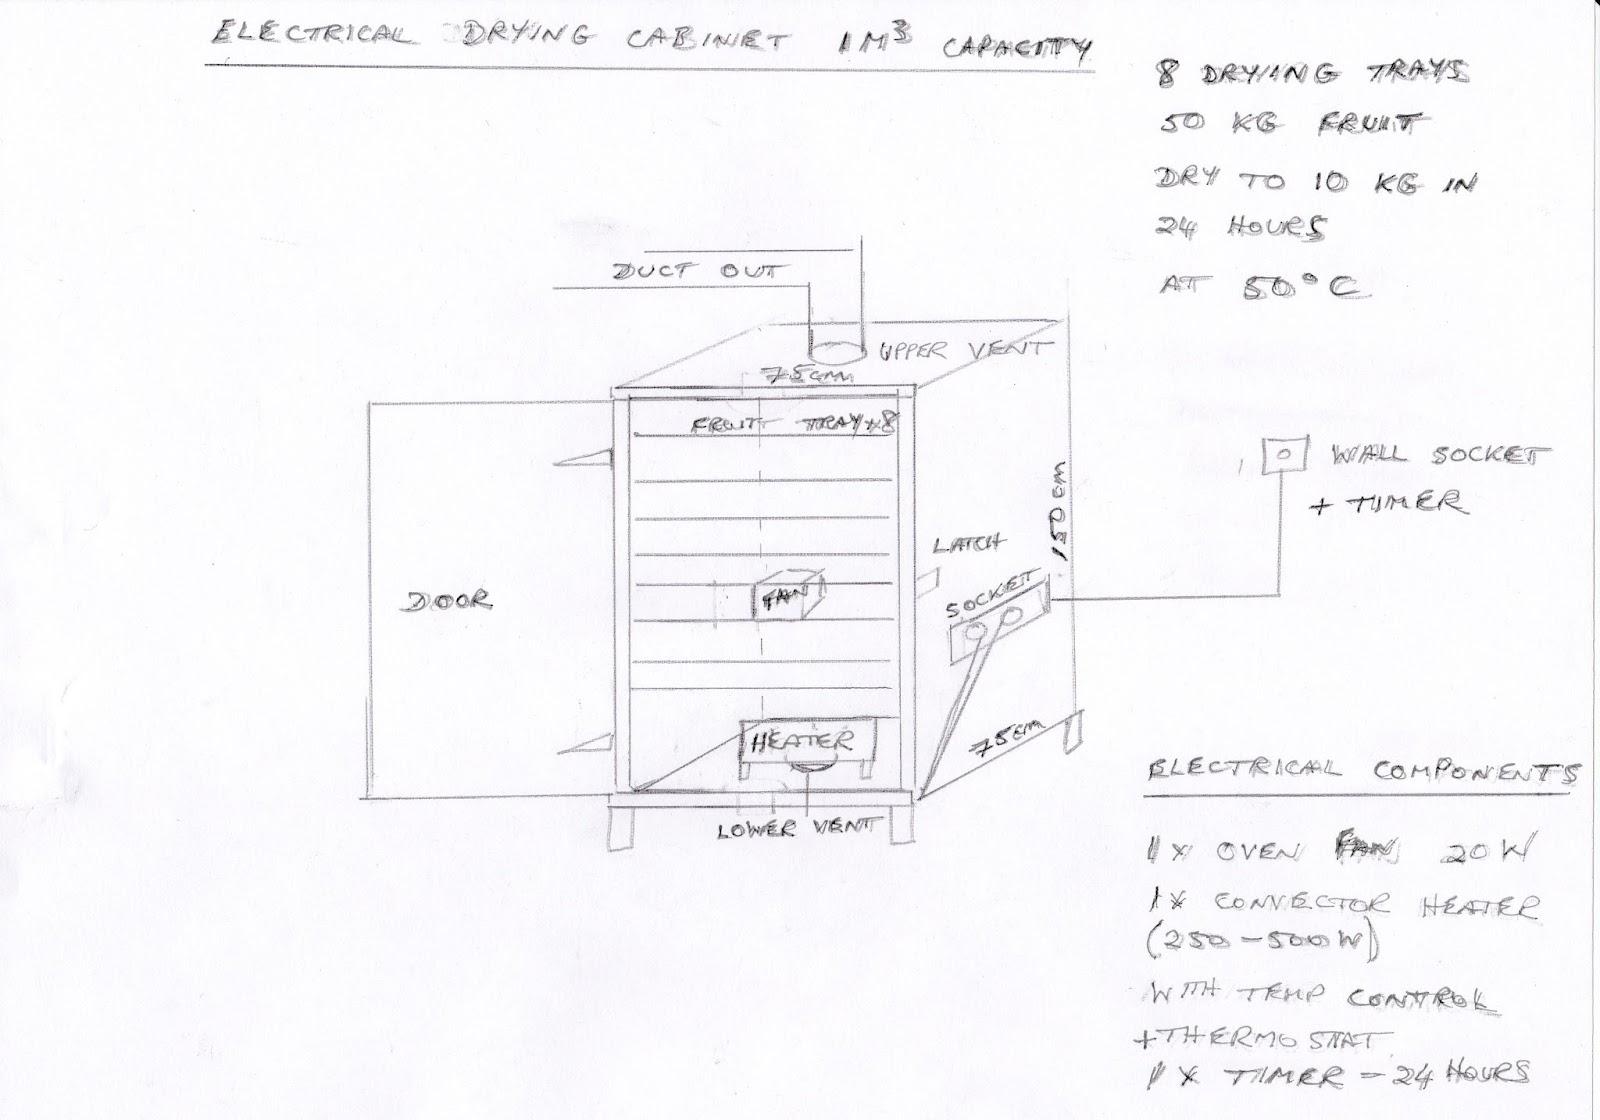 Cabinet drier - 1 Cubic metre.jpg